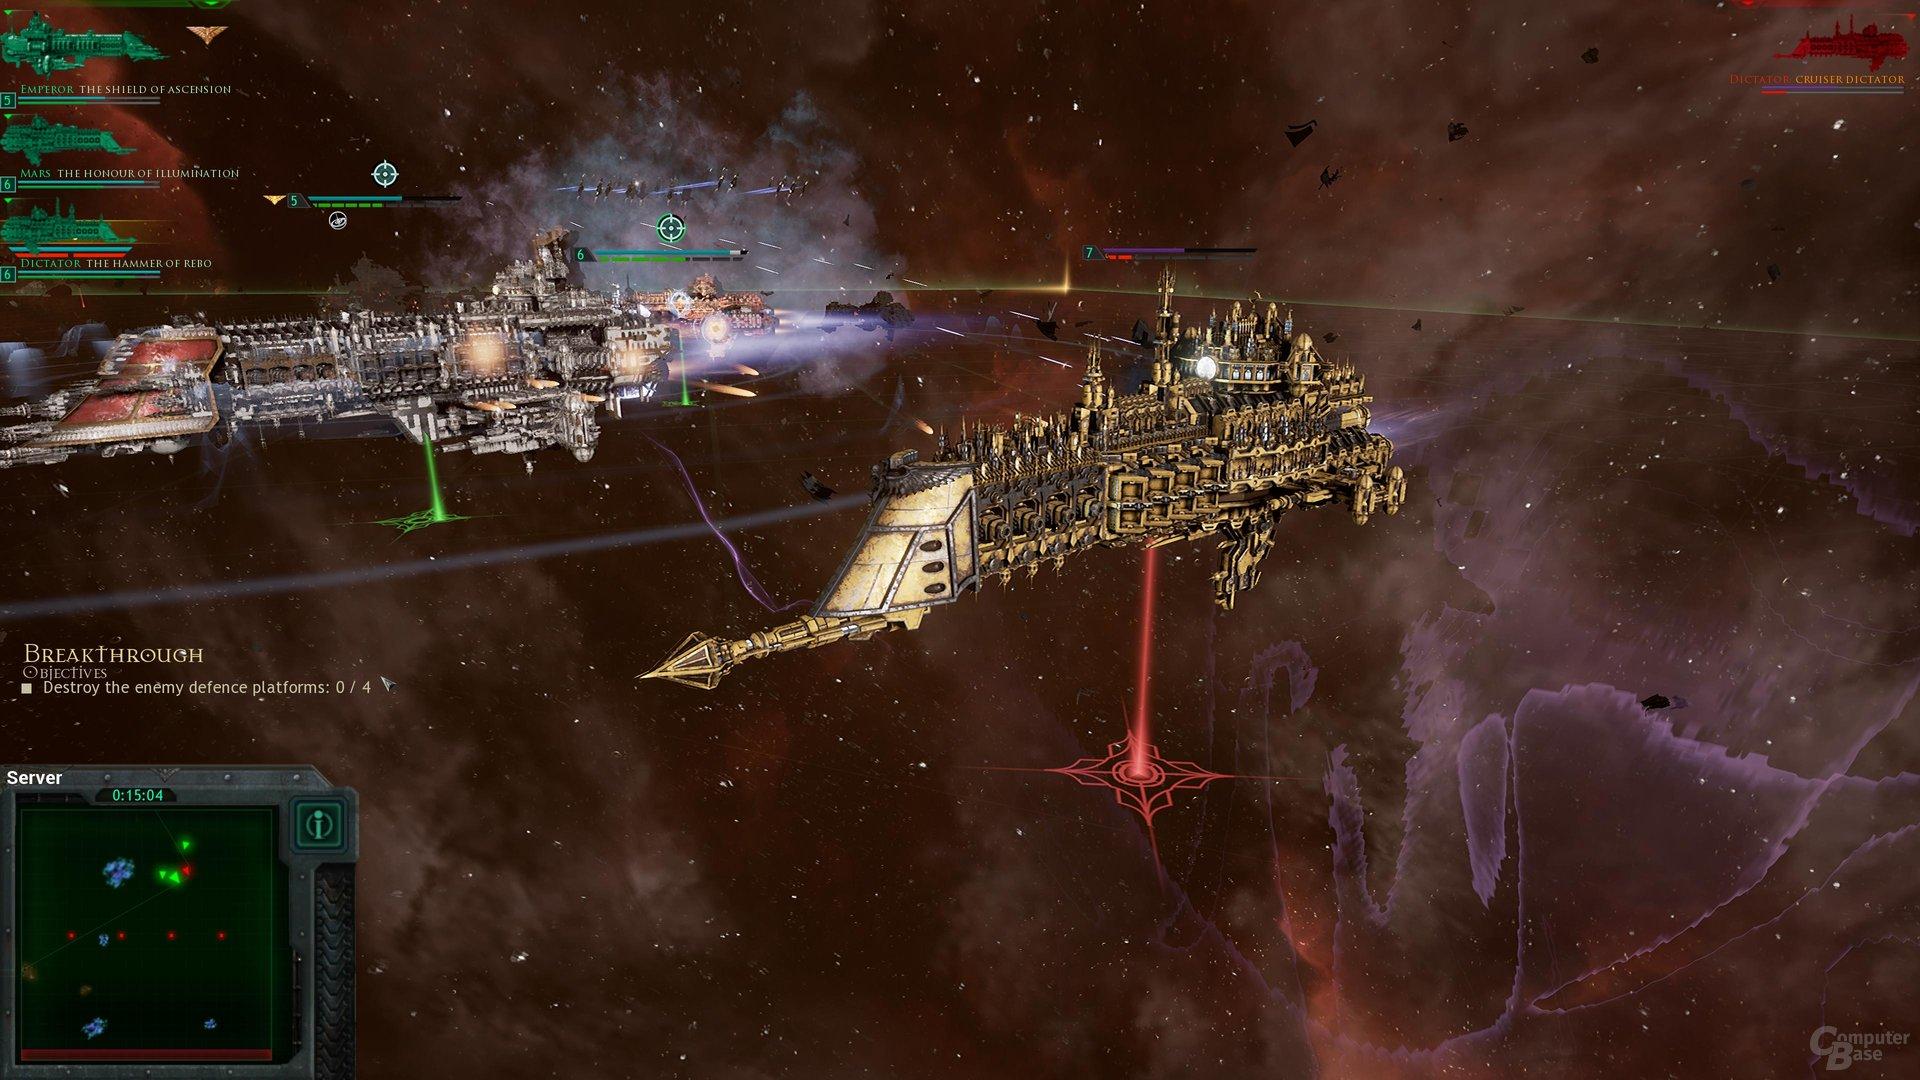 Makro-Batterien machen das Imperium im Nahkampf stark